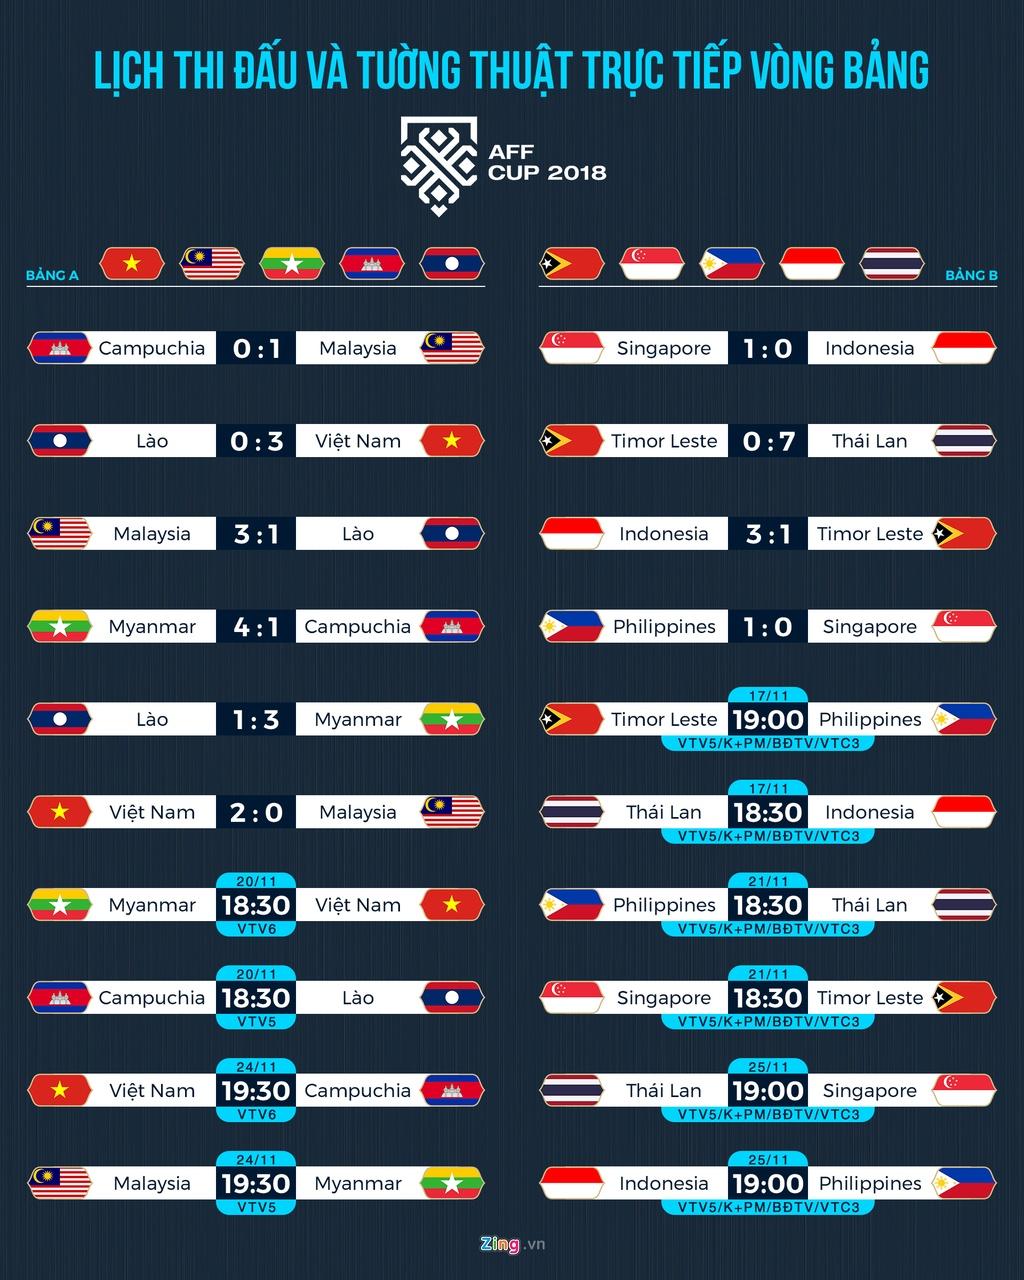 Lich thi dau AFF Cup: DT Thai Lan cham tran Indonesia hinh anh 1